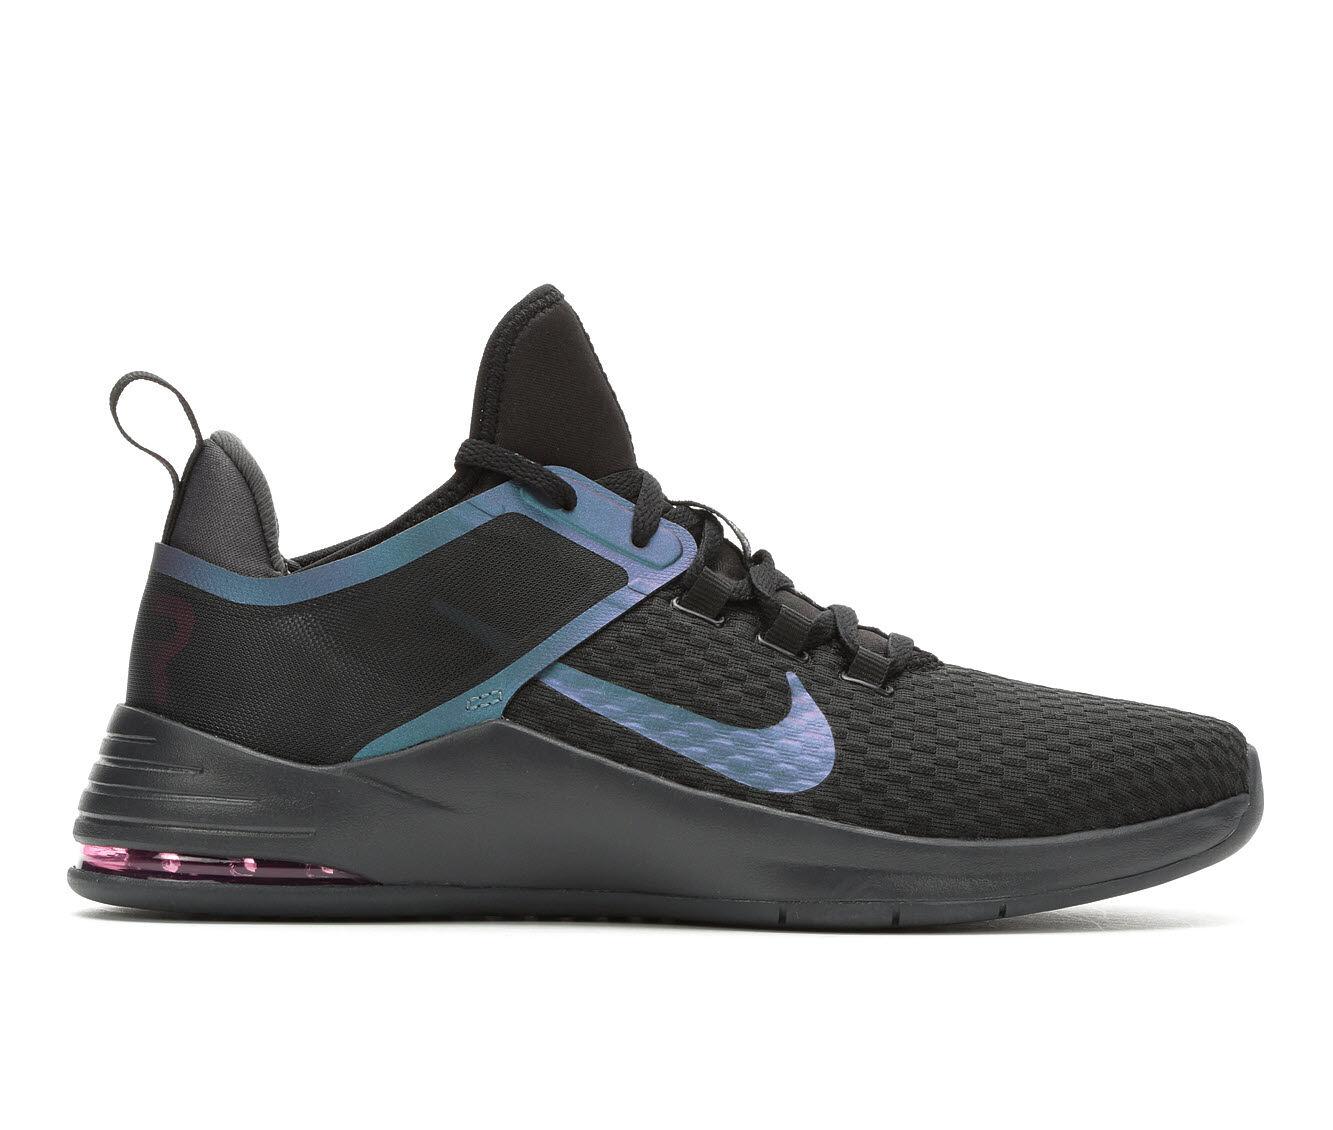 Women's Nike Air Bella TR 2 Training Shoes Black/Laser